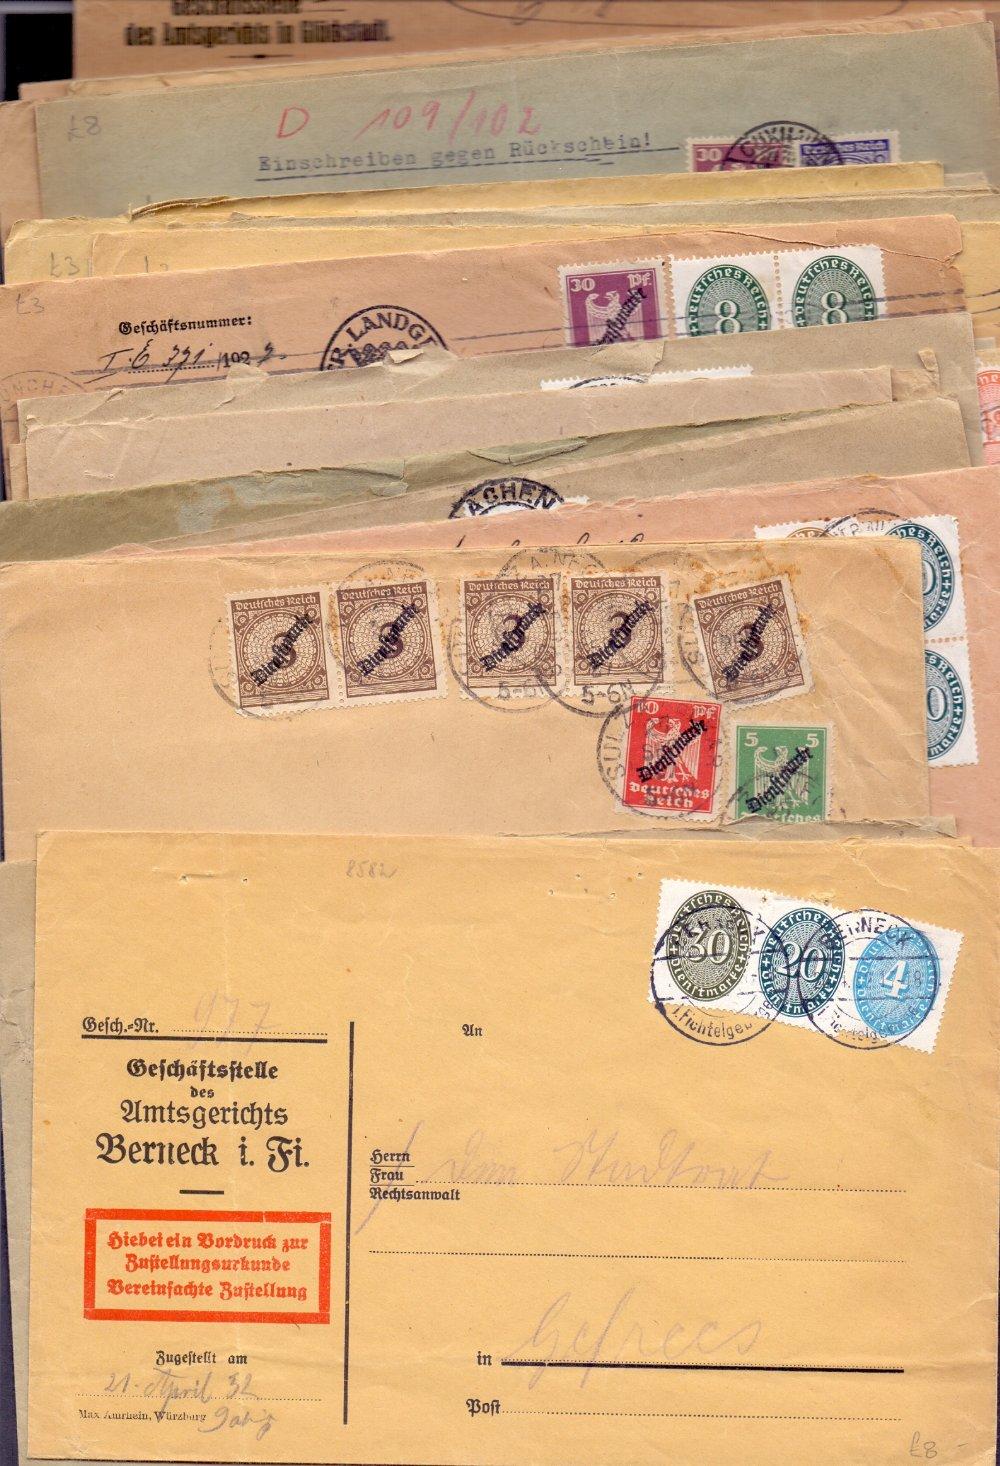 Lot 86 - POSTAL HISTORY : GERMANY, selection of O